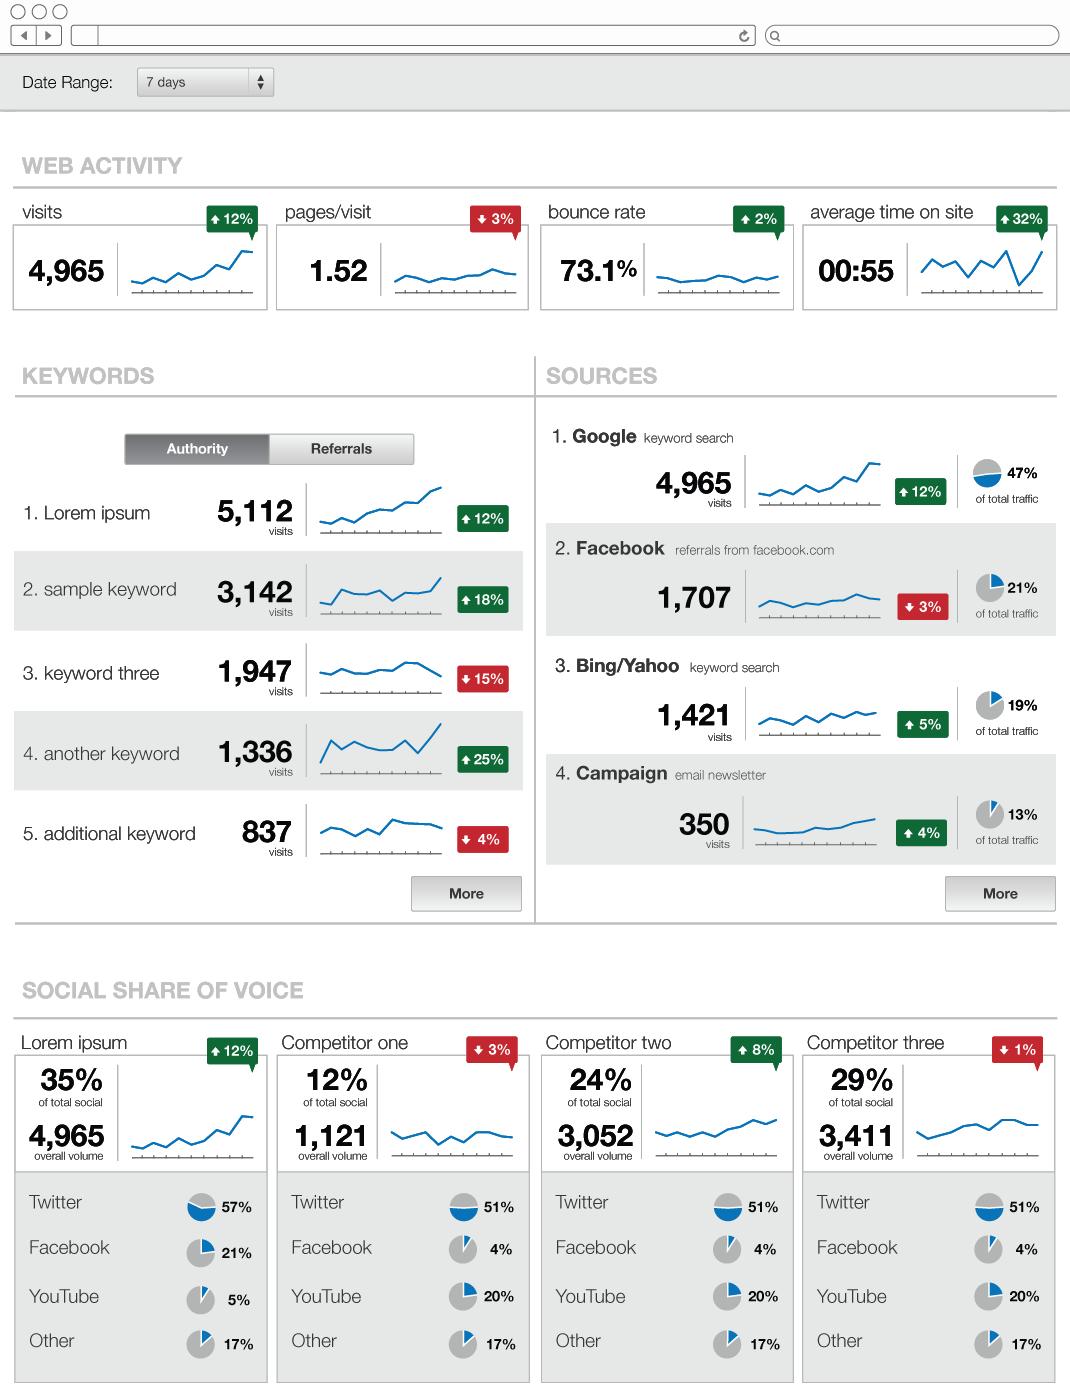 Digital Strategy Dashboard page 1